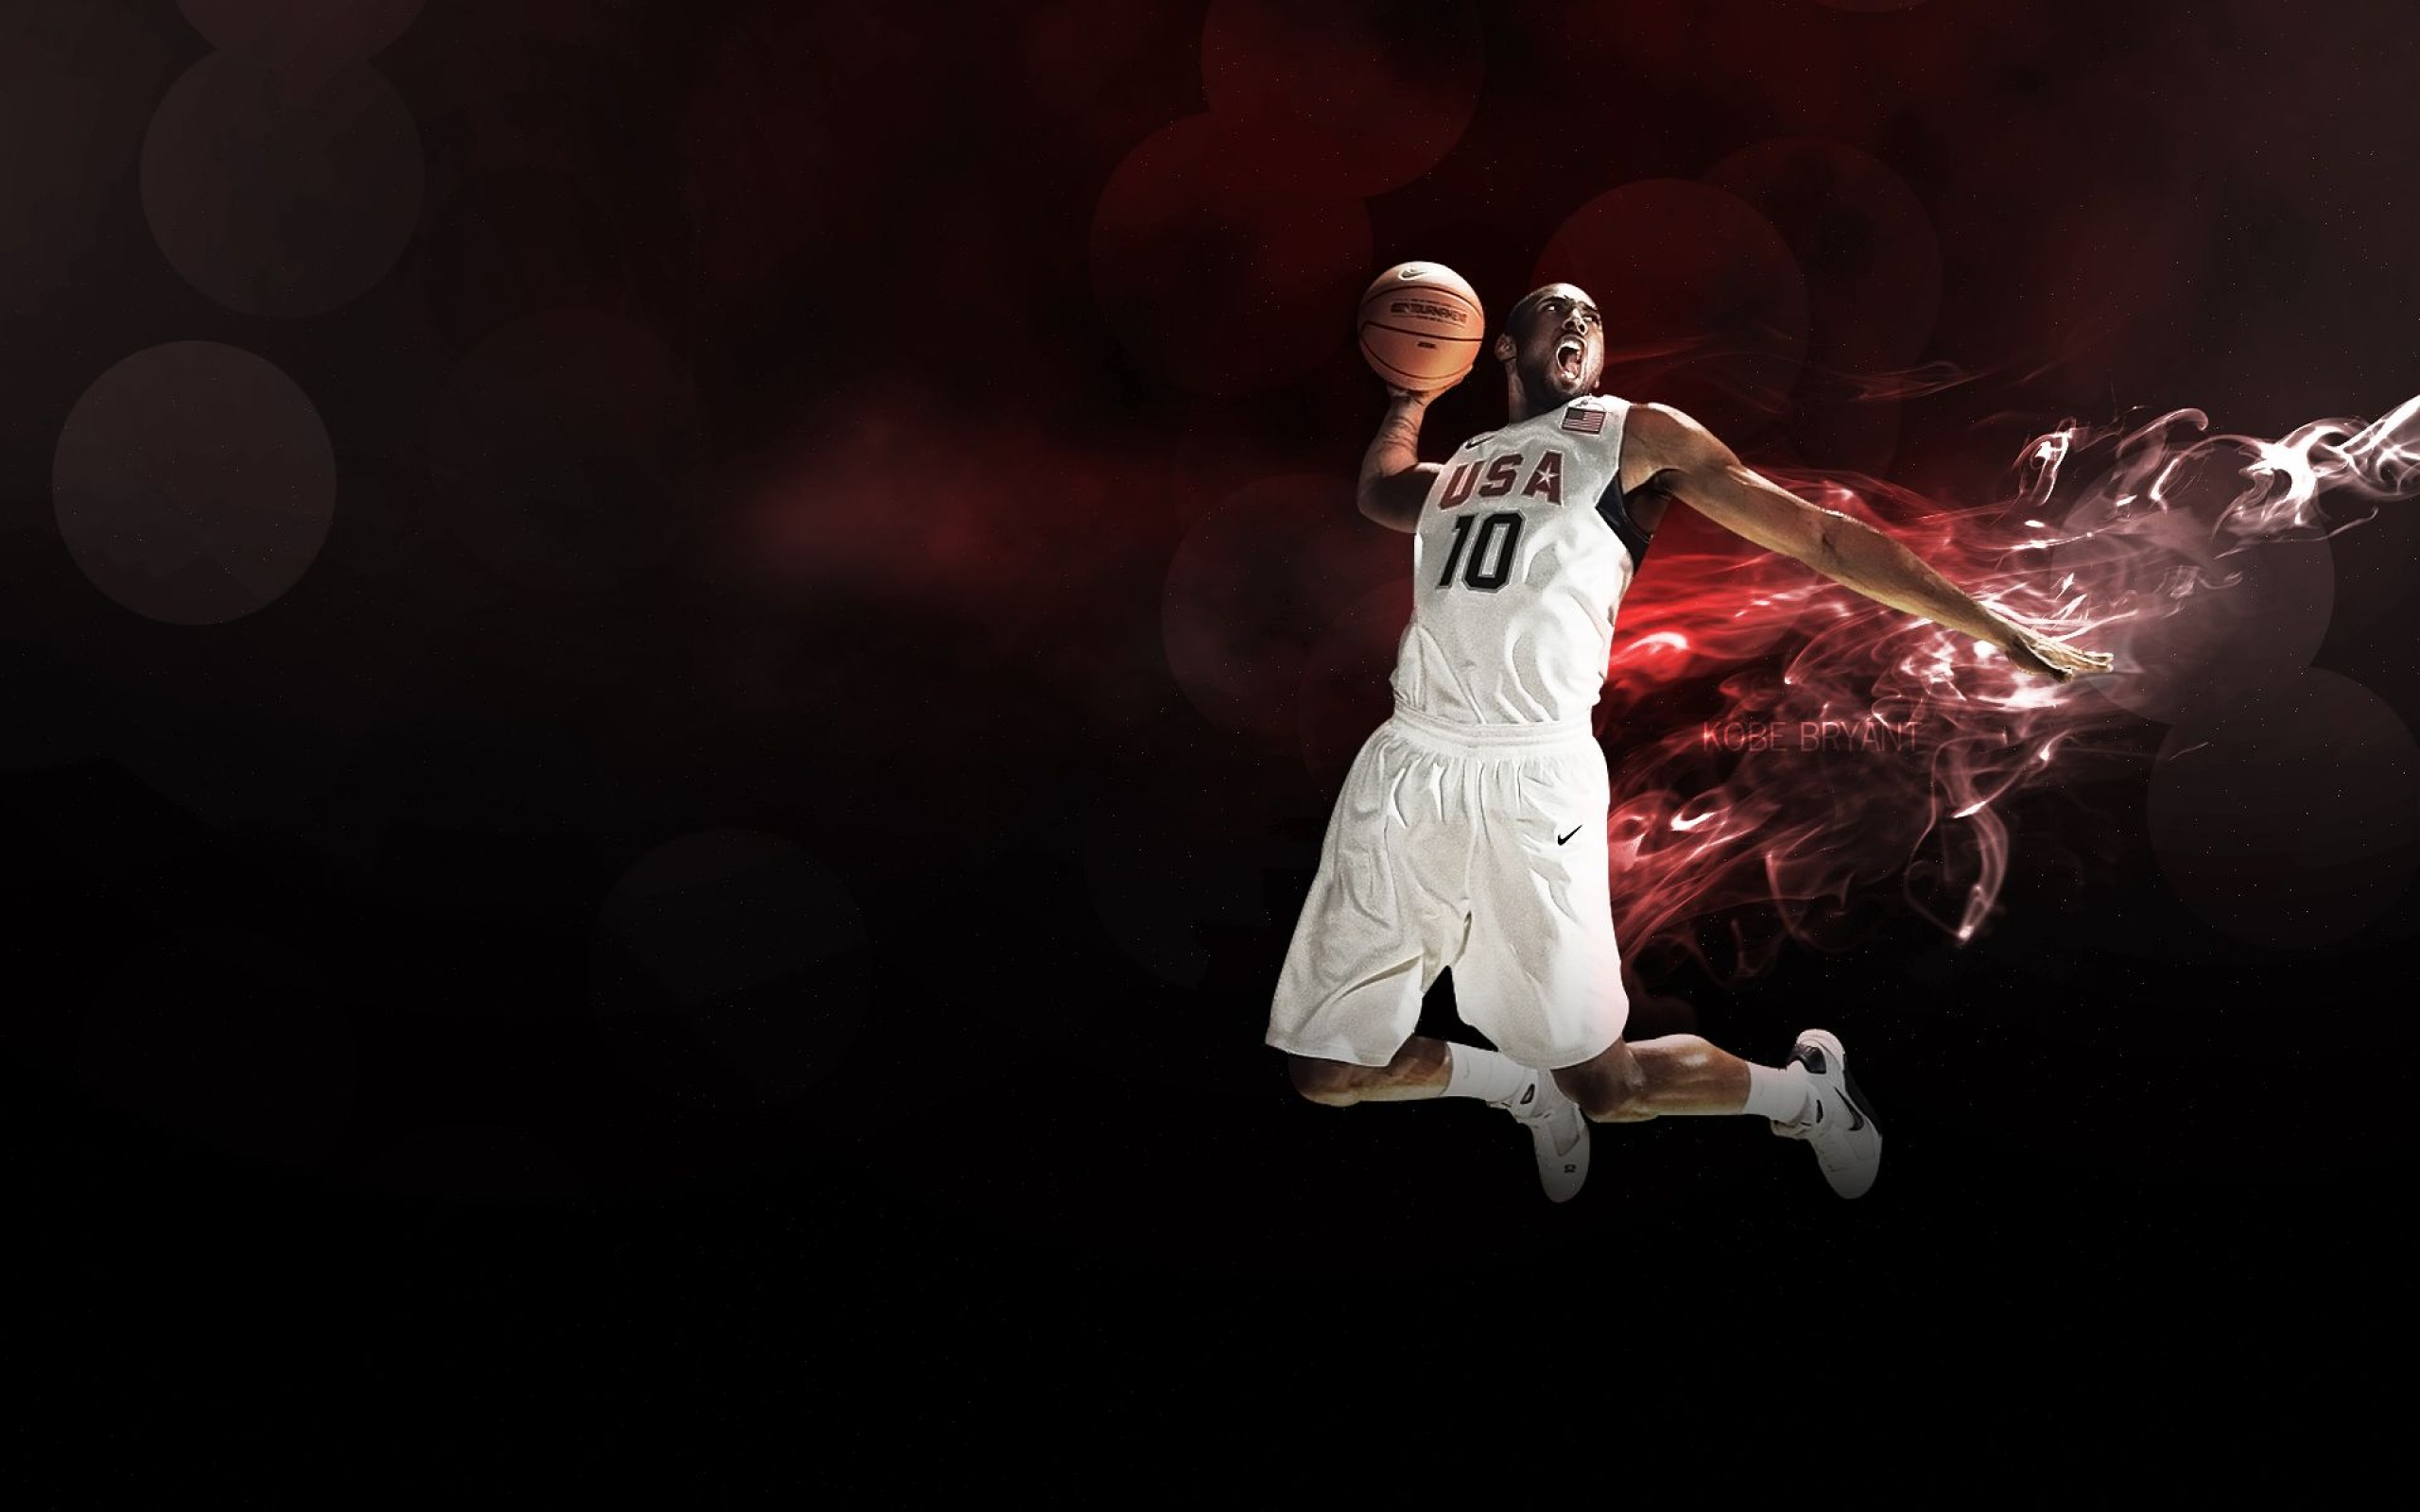 Los Angeles Lakers Wallpaper Hd Kobe Bryant Wallpapers Hd Collection Pixelstalk Net